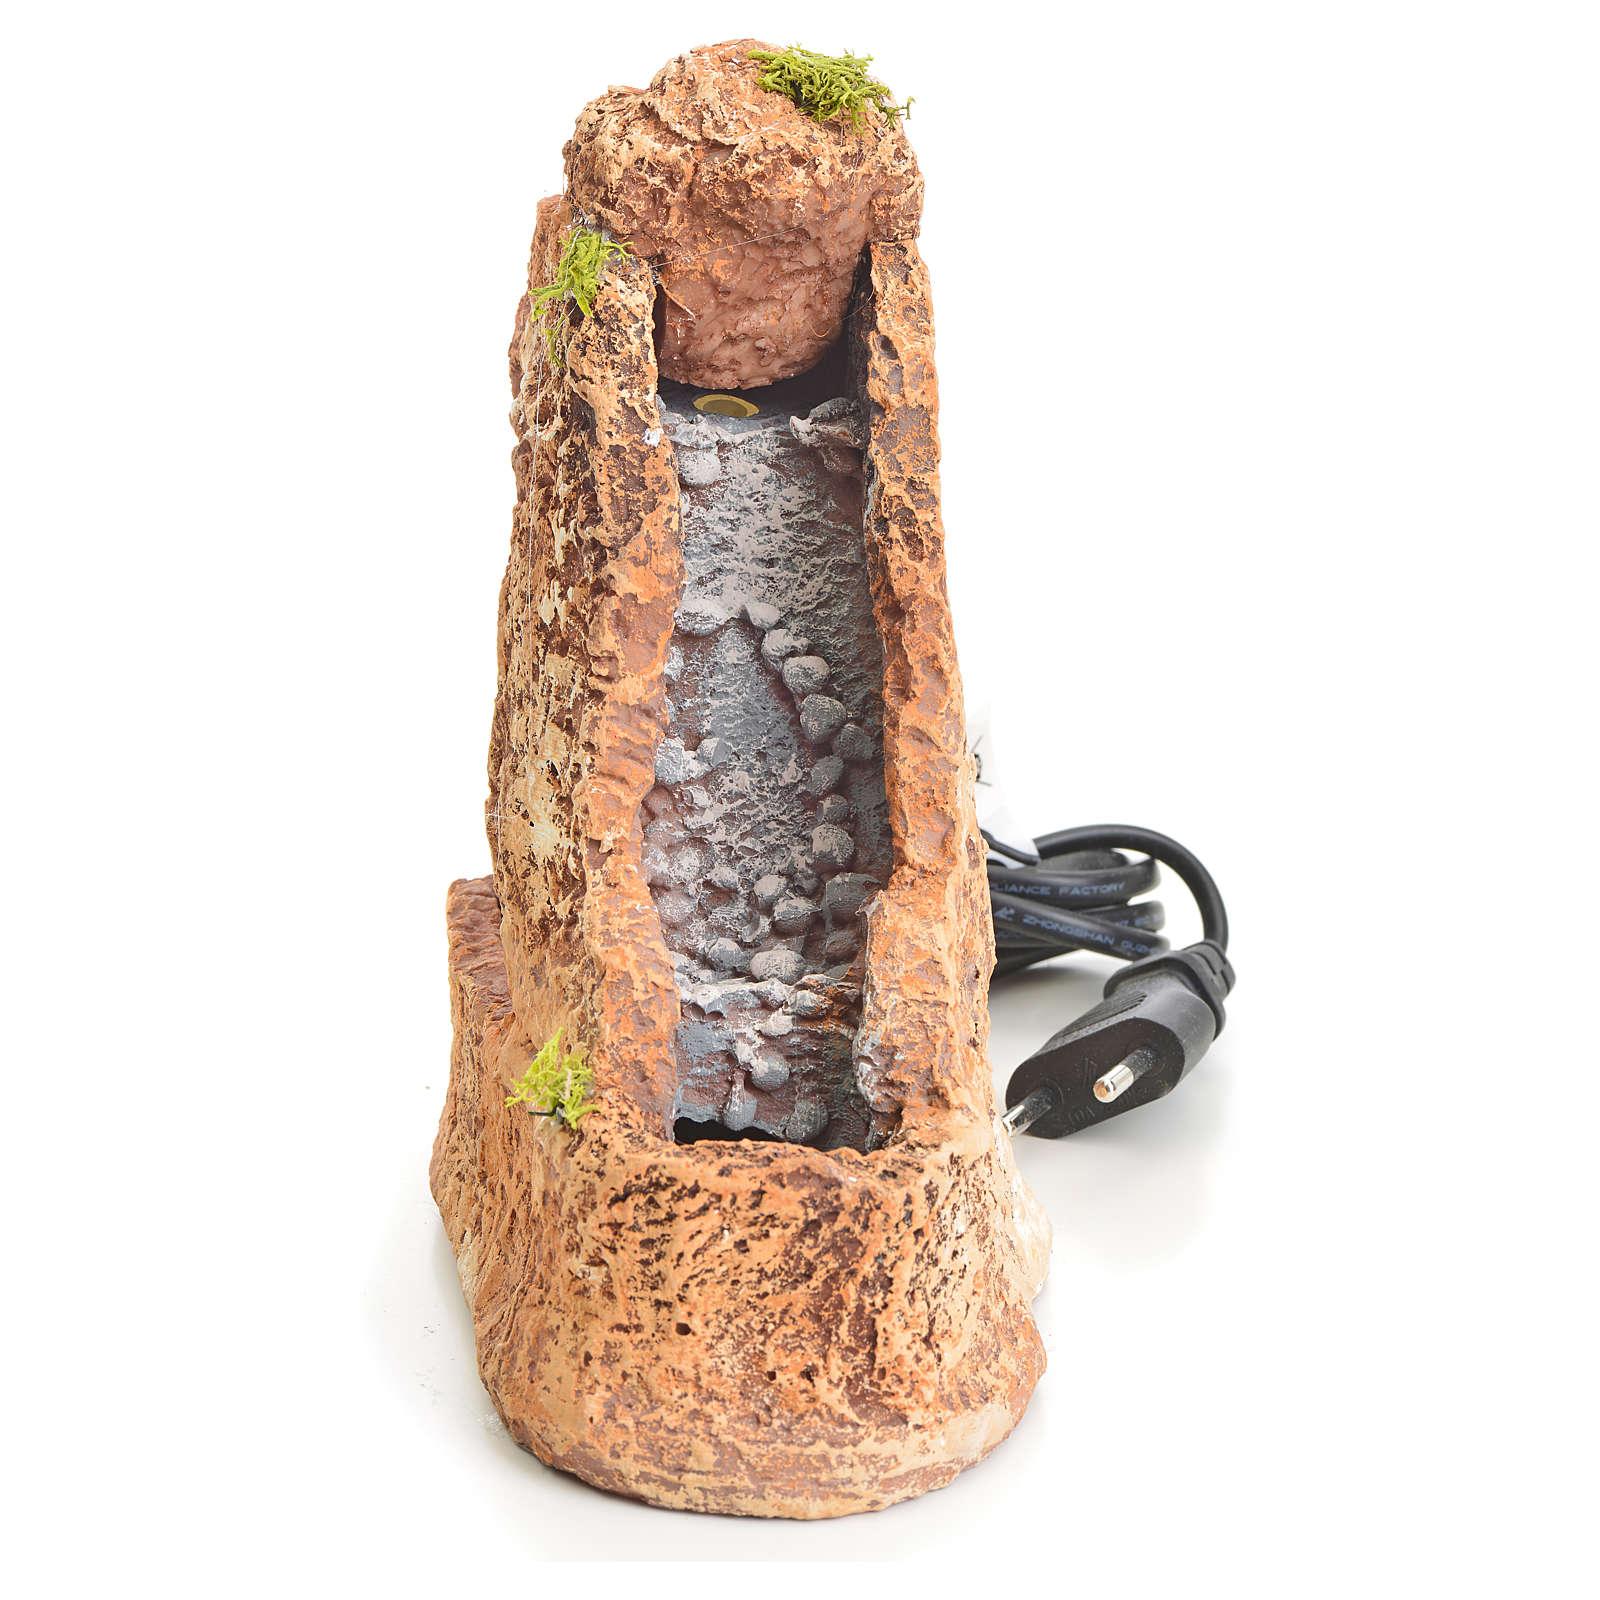 Riochuelo en resina pesebre 20x8x18cm 4